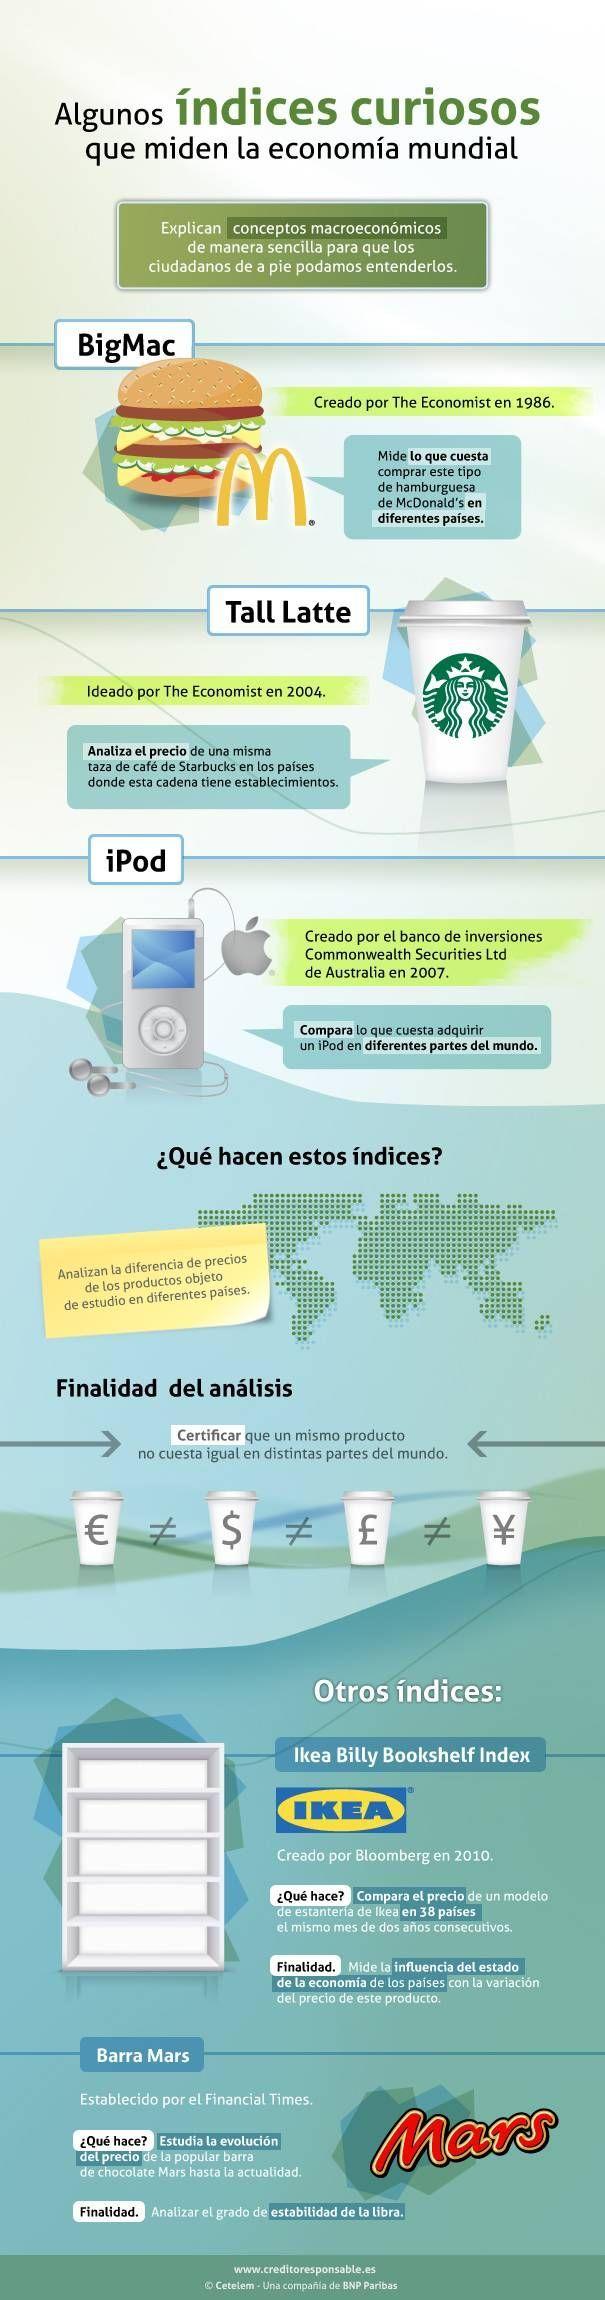 http://ticsyformacion.com/2013/01/09/indices-curiosos-para-medir-la-economia-mundial-infografia-infographic/